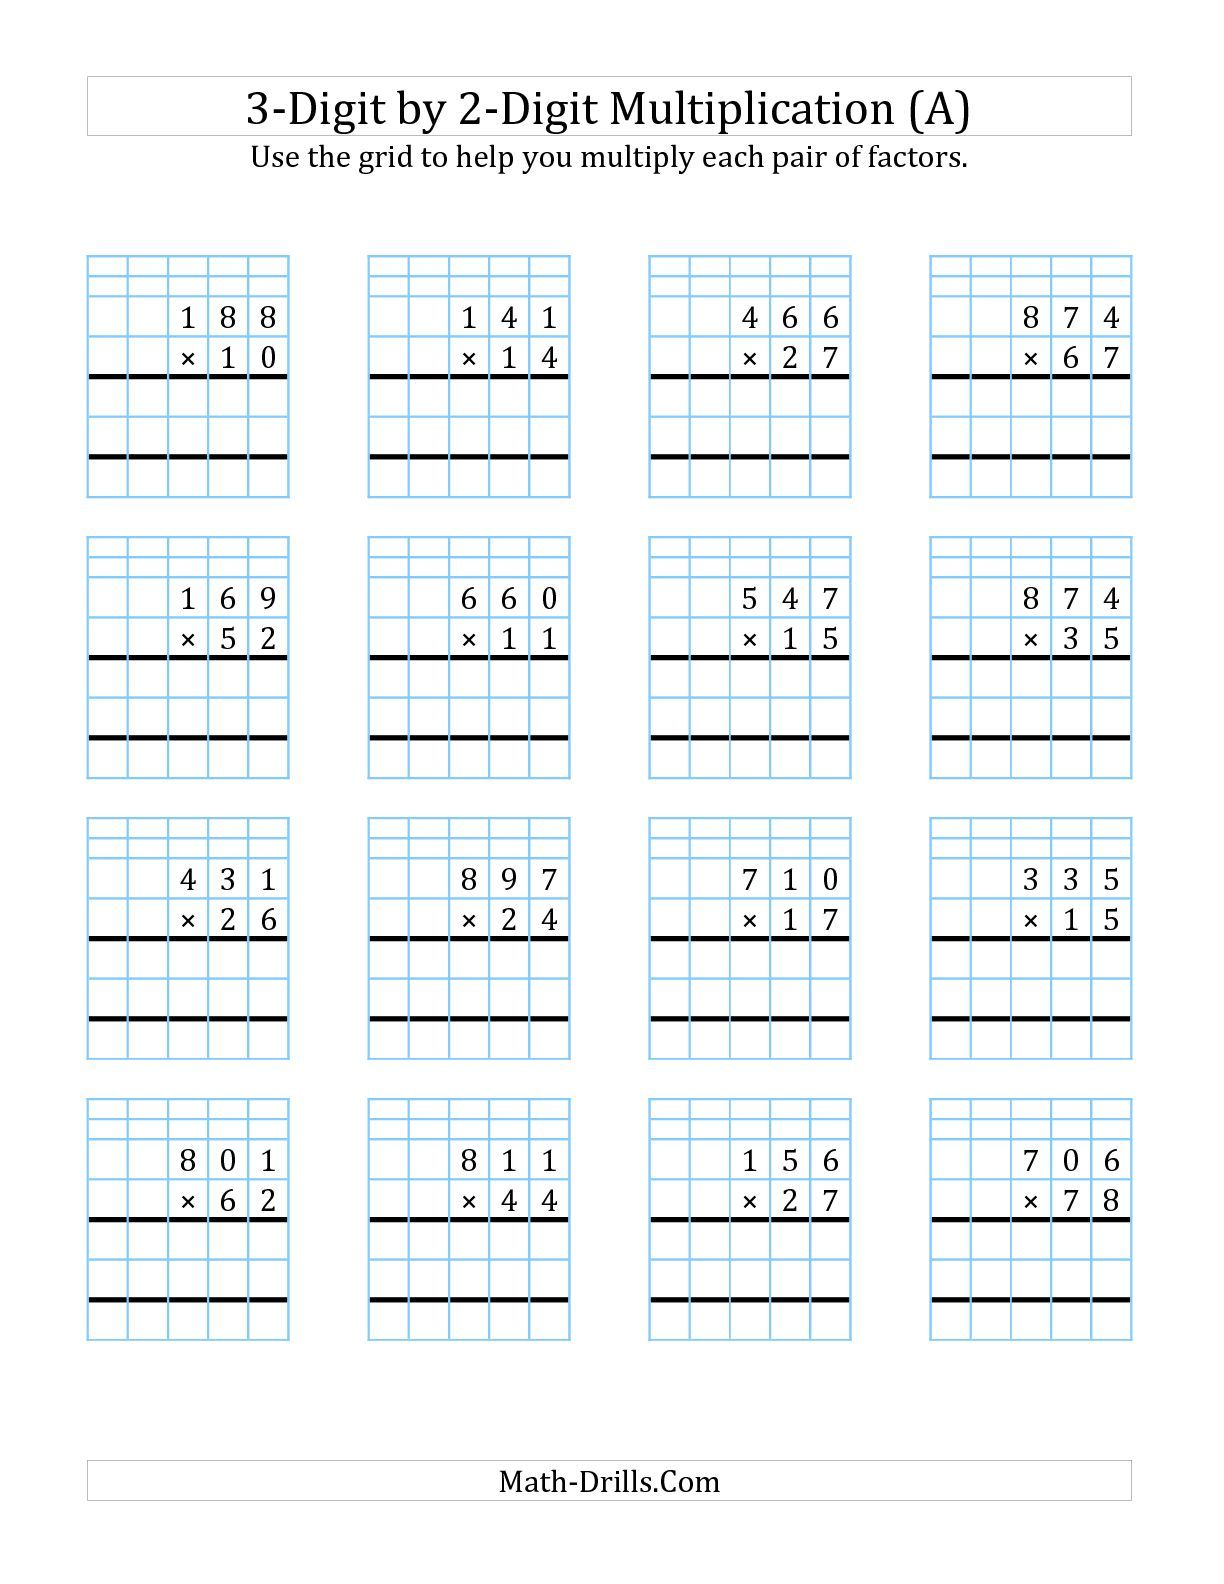 3 digit by 2 digit multiplication with grid support a math worksheet freemath kids math. Black Bedroom Furniture Sets. Home Design Ideas